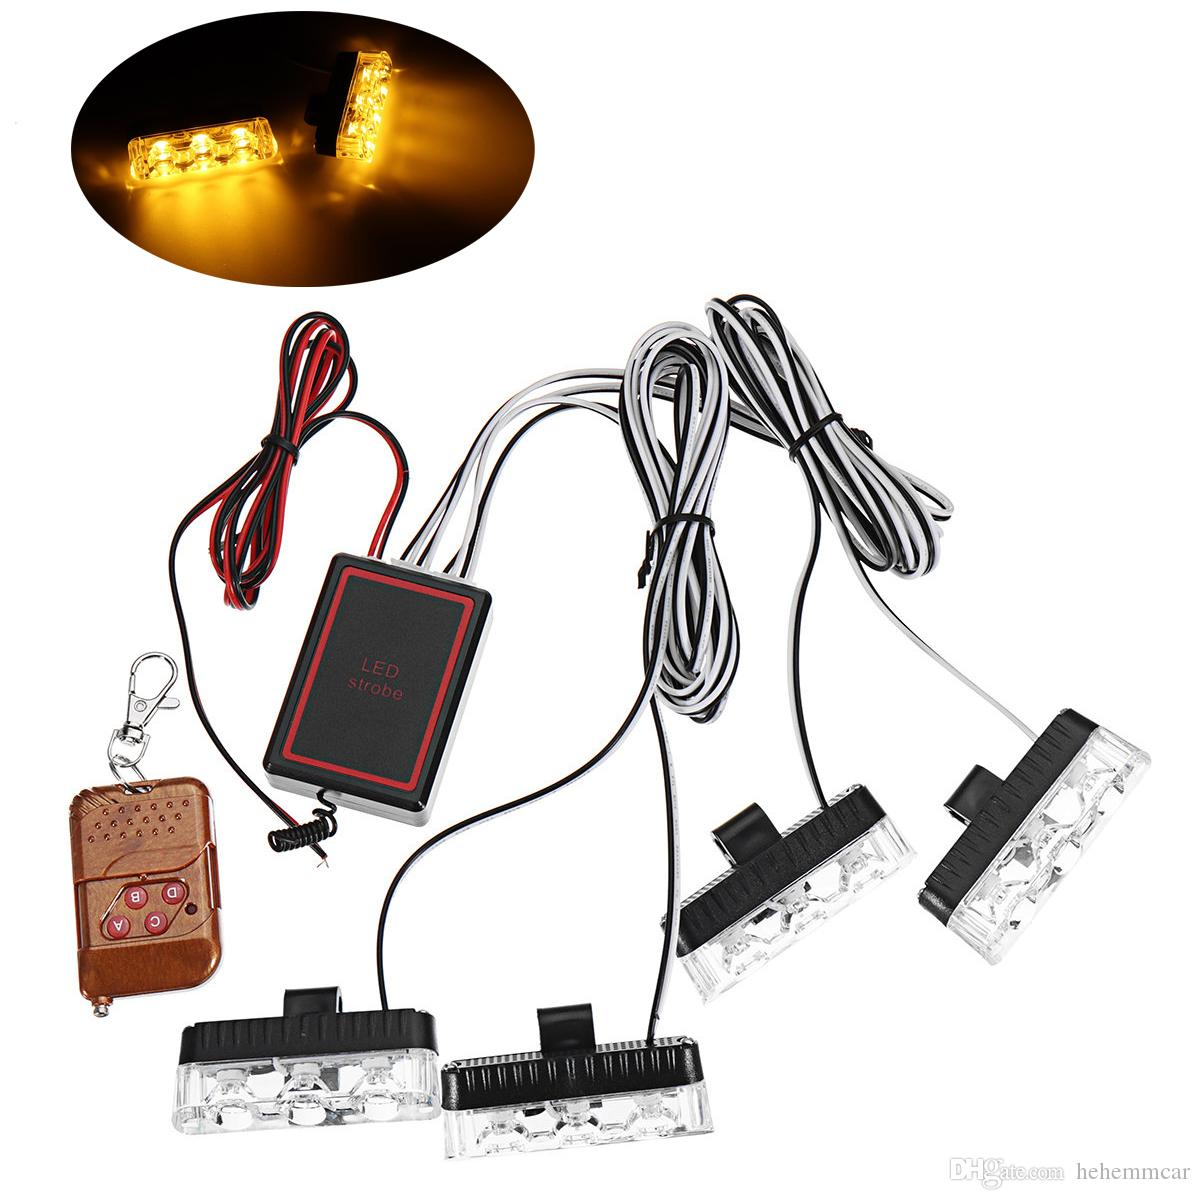 Superb Hehemm 4 X 4 Led 16 Leds Wireless Remote Car Strobe Light Universal Wiring Digital Resources Llinedefiancerspsorg